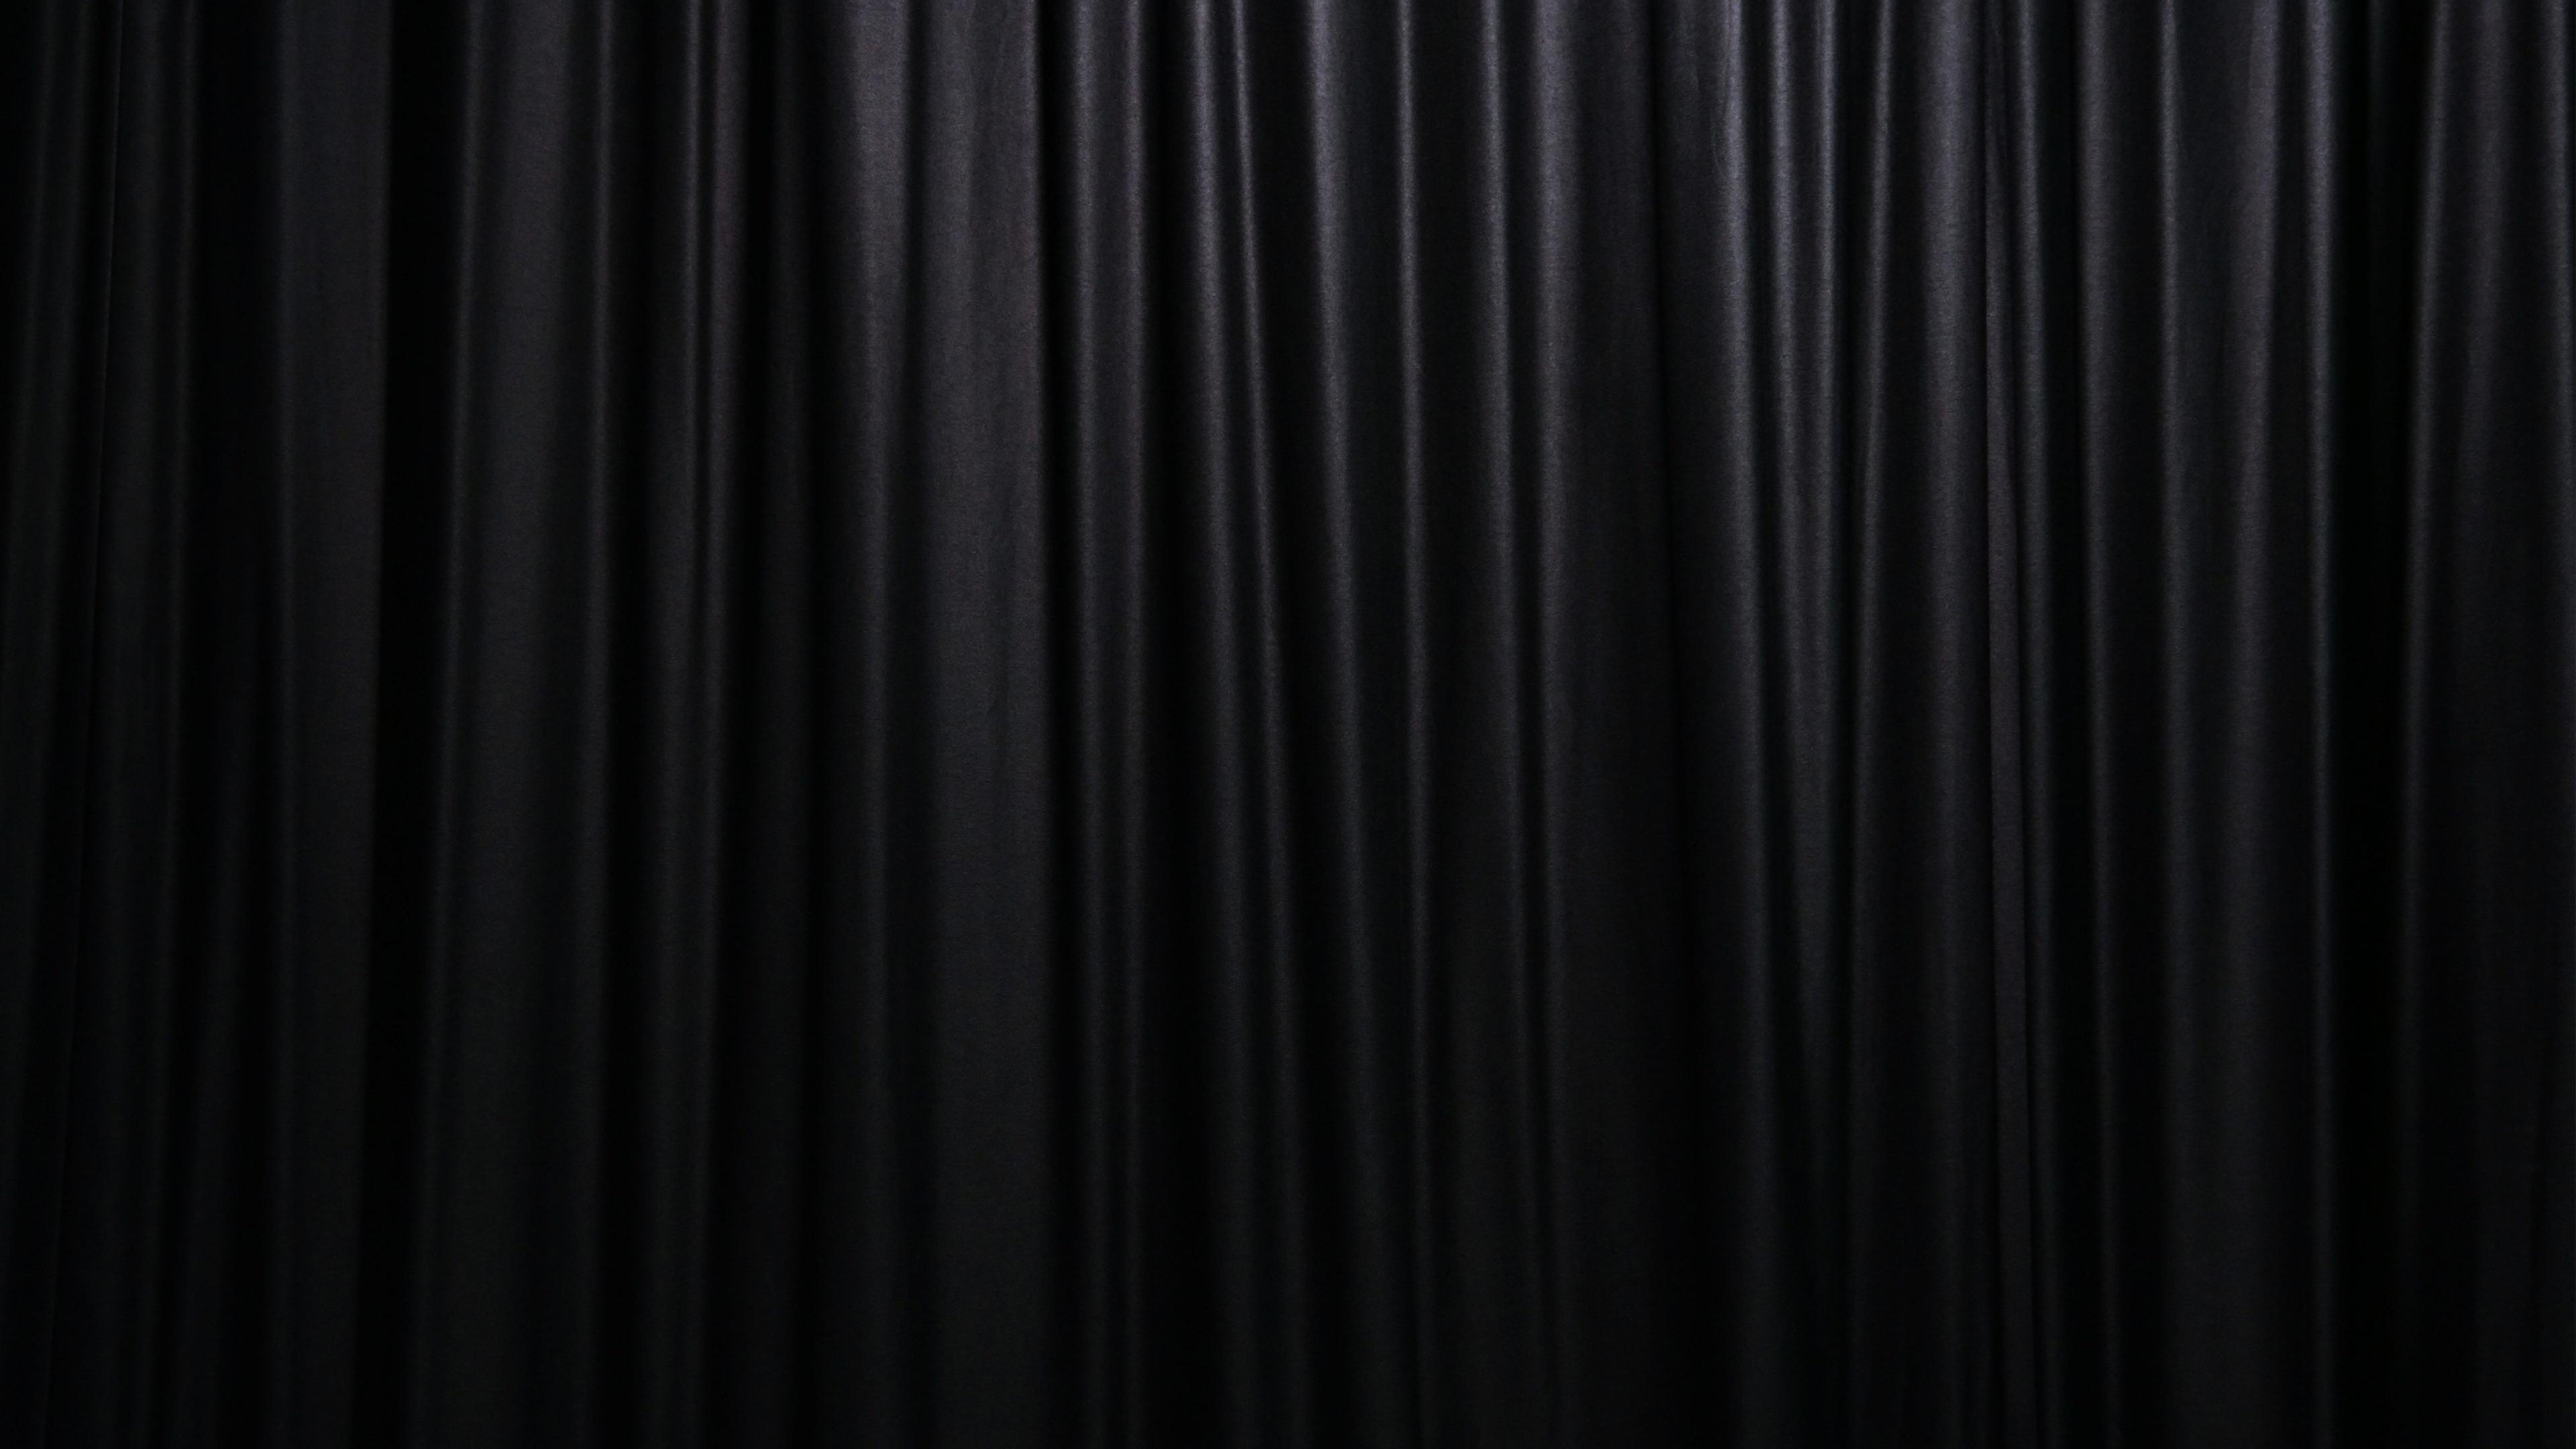 46] 4K Black Wallpaper on WallpaperSafari 3840x2160